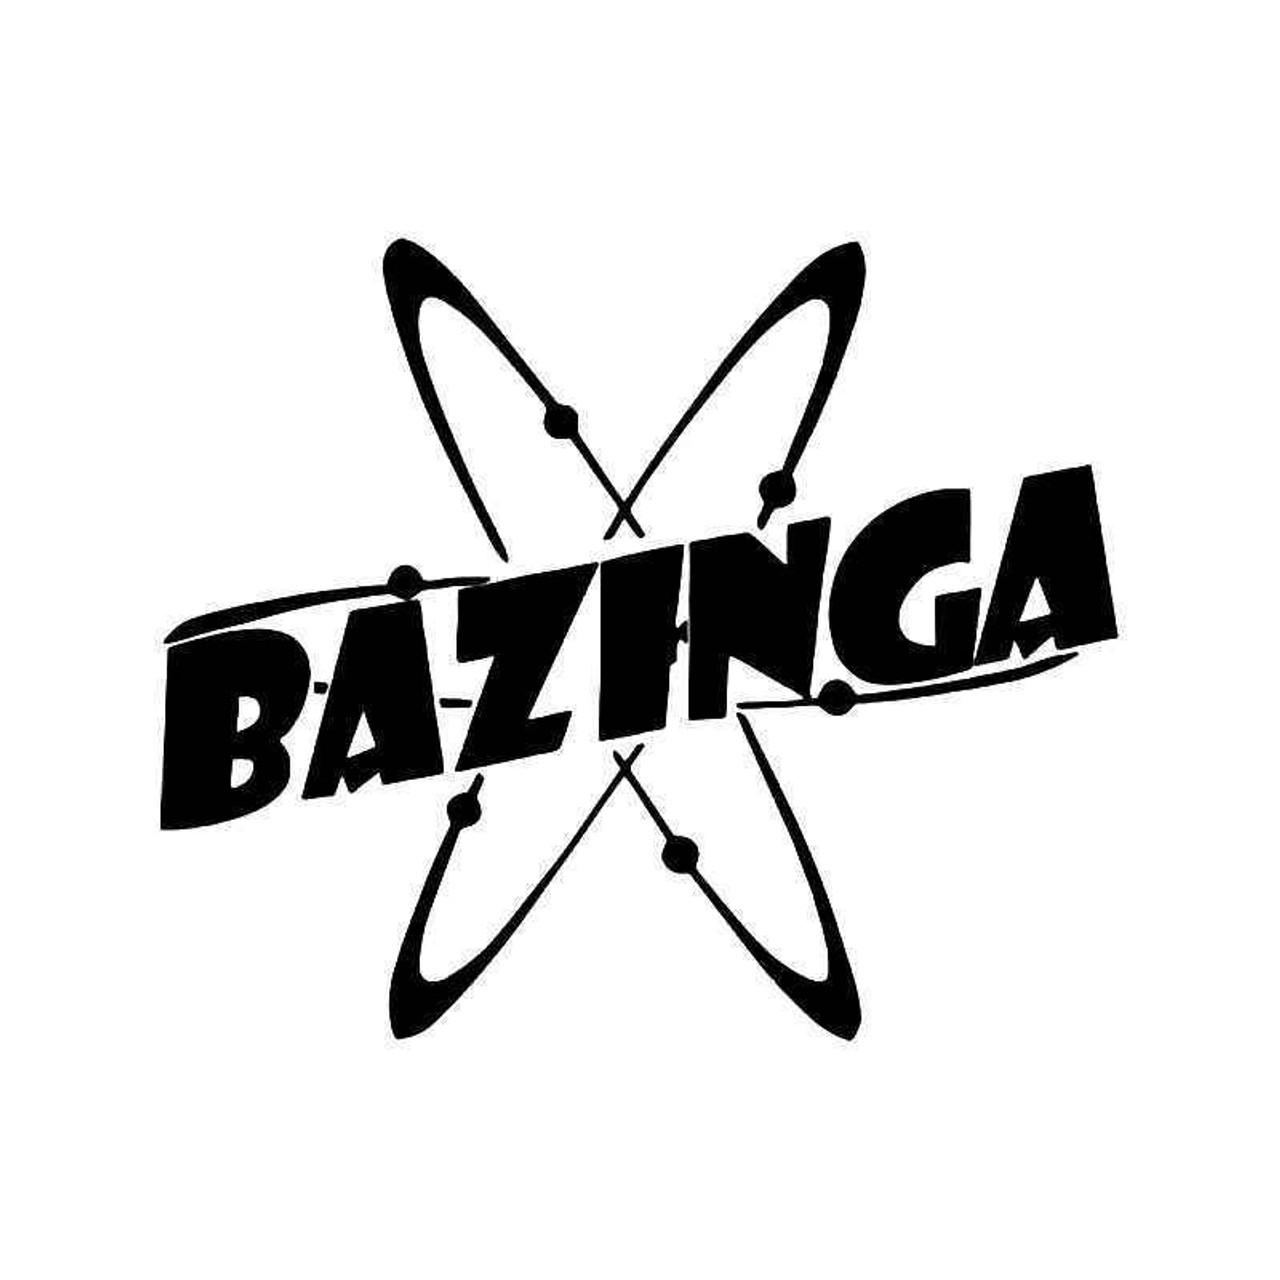 BAZINGA Vinyl Decal